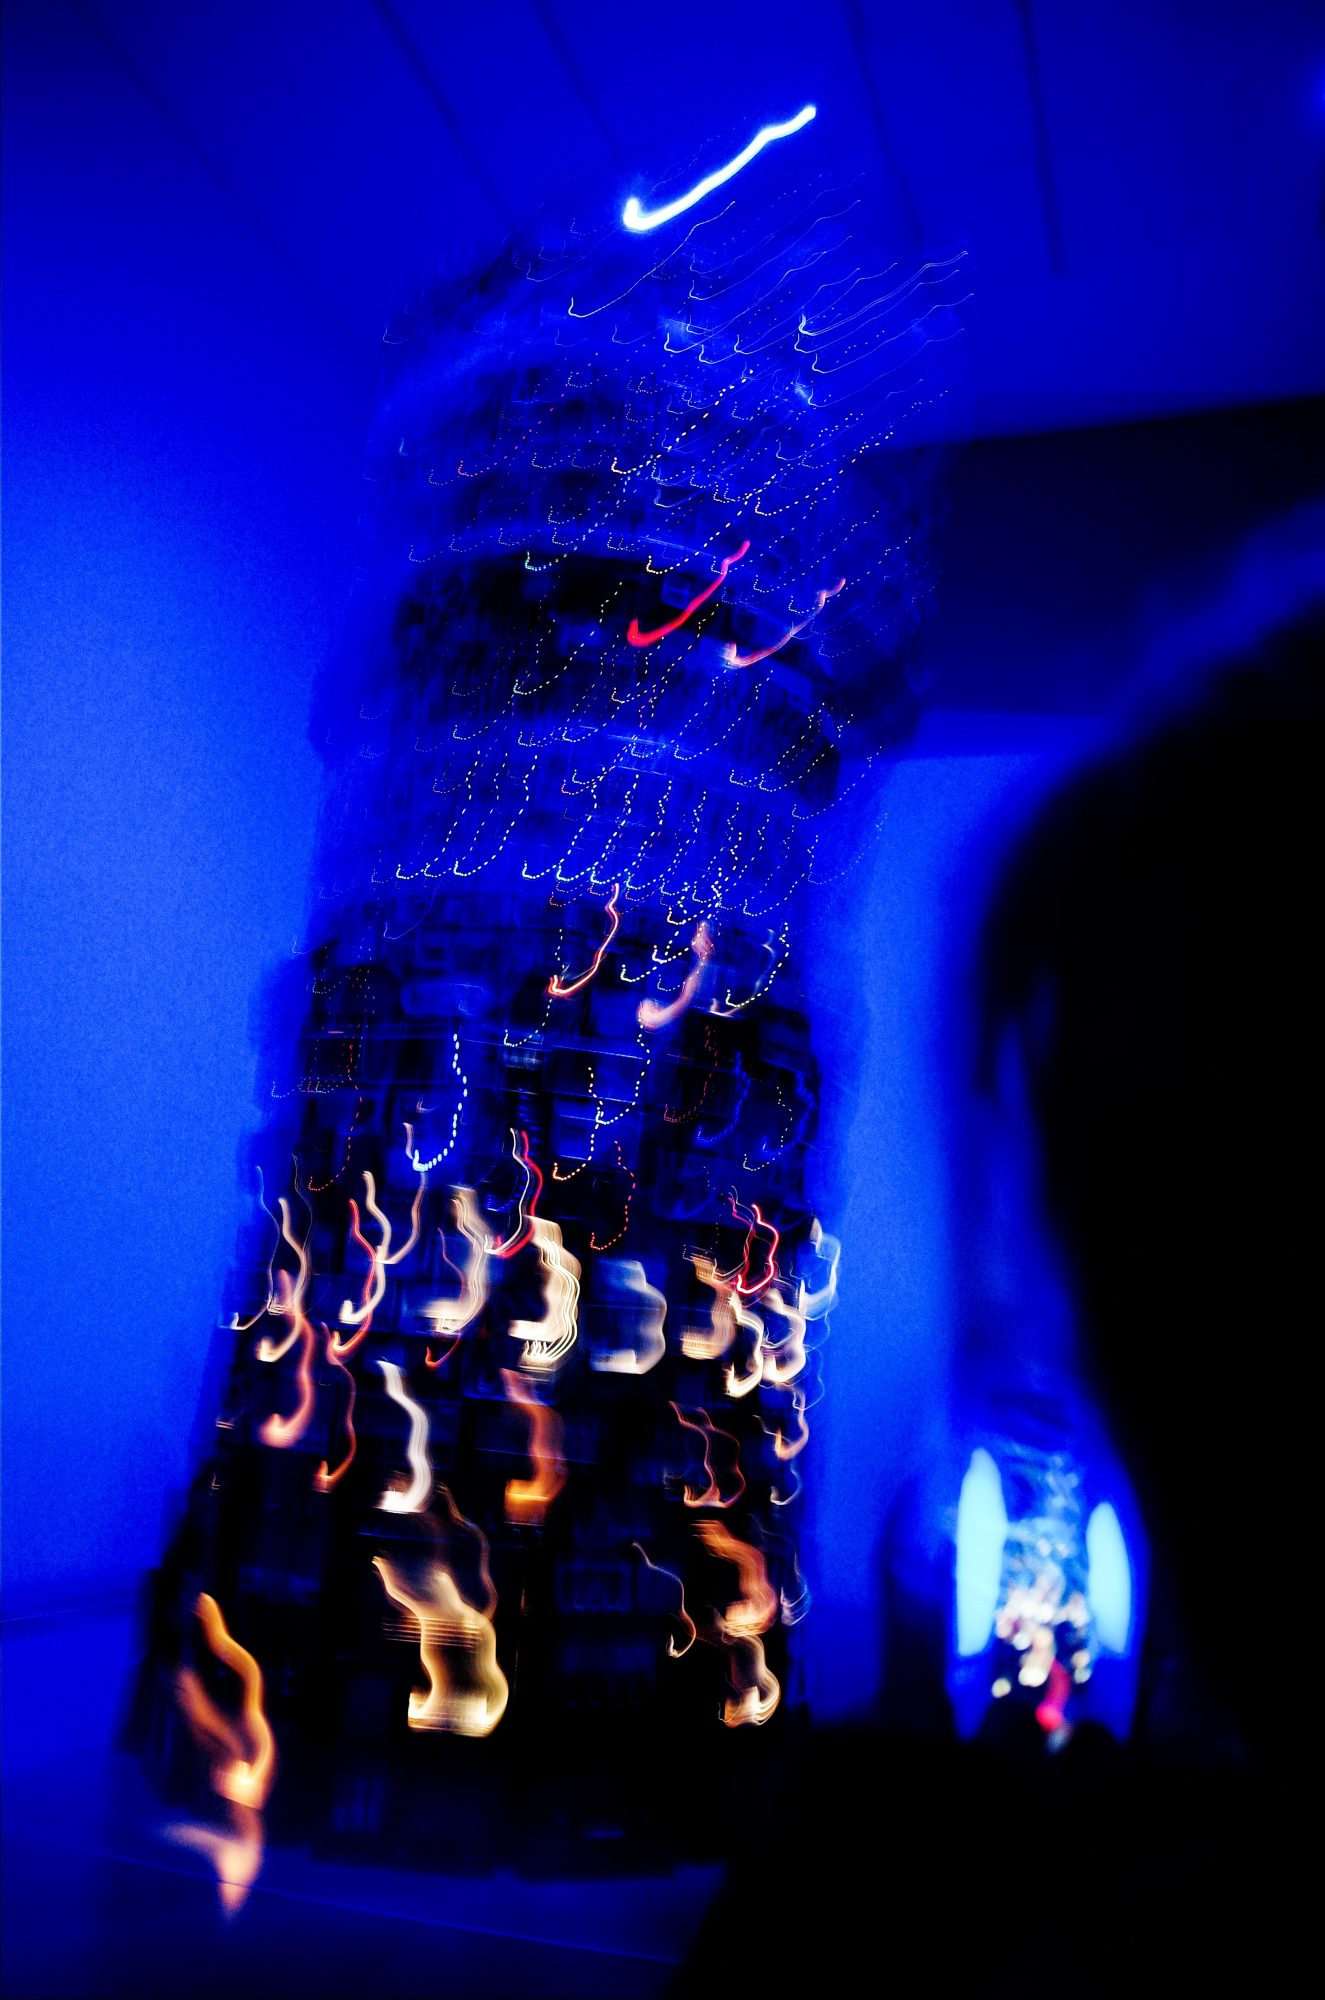 blue blurred TATE